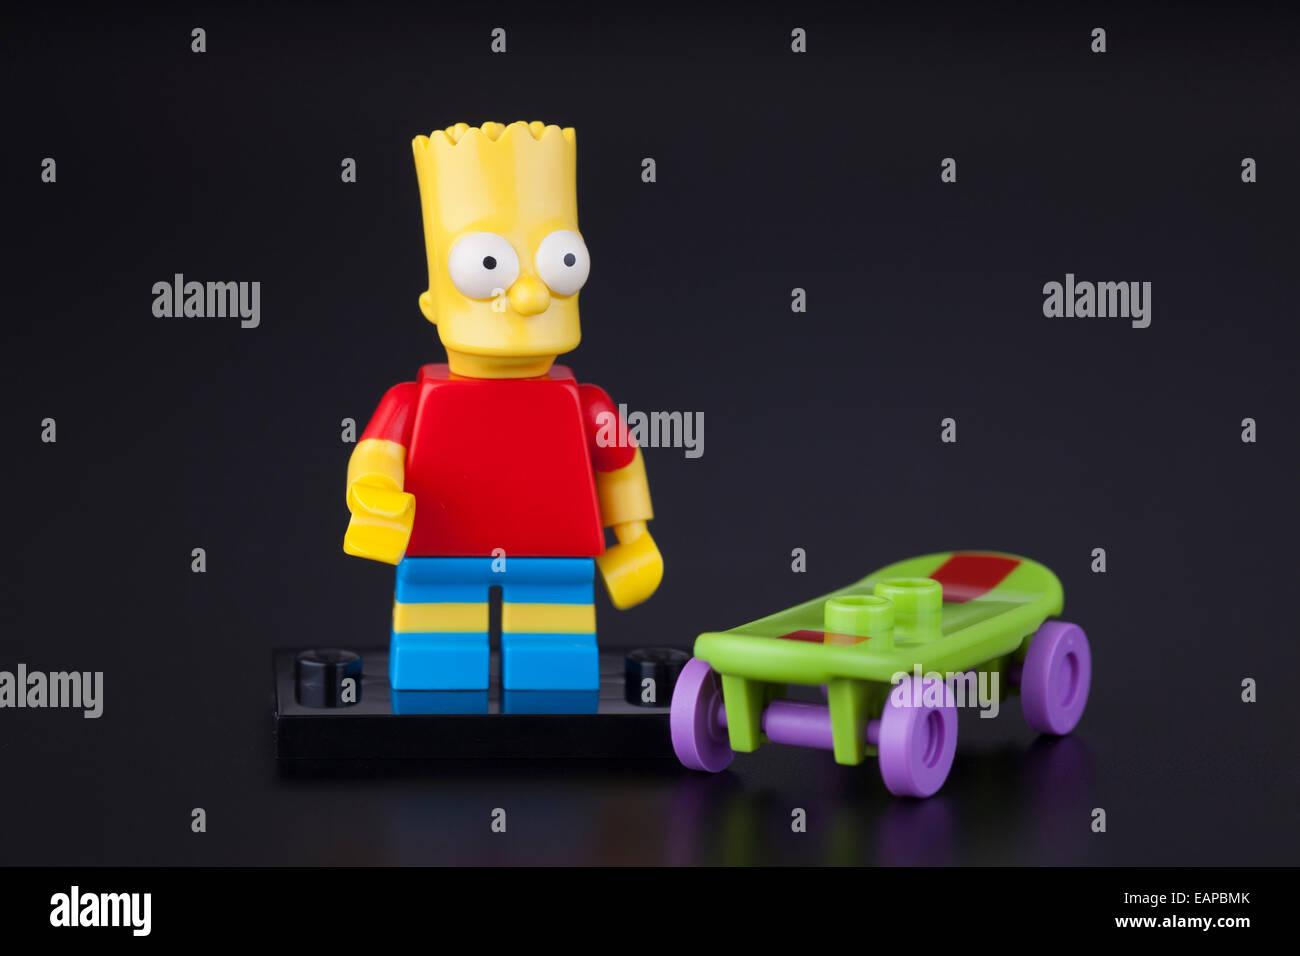 Tambov, Russian Federation - April 30, 2014 Lego Bart Simpson minifigure with skateboard on black background. Studio - Stock Image